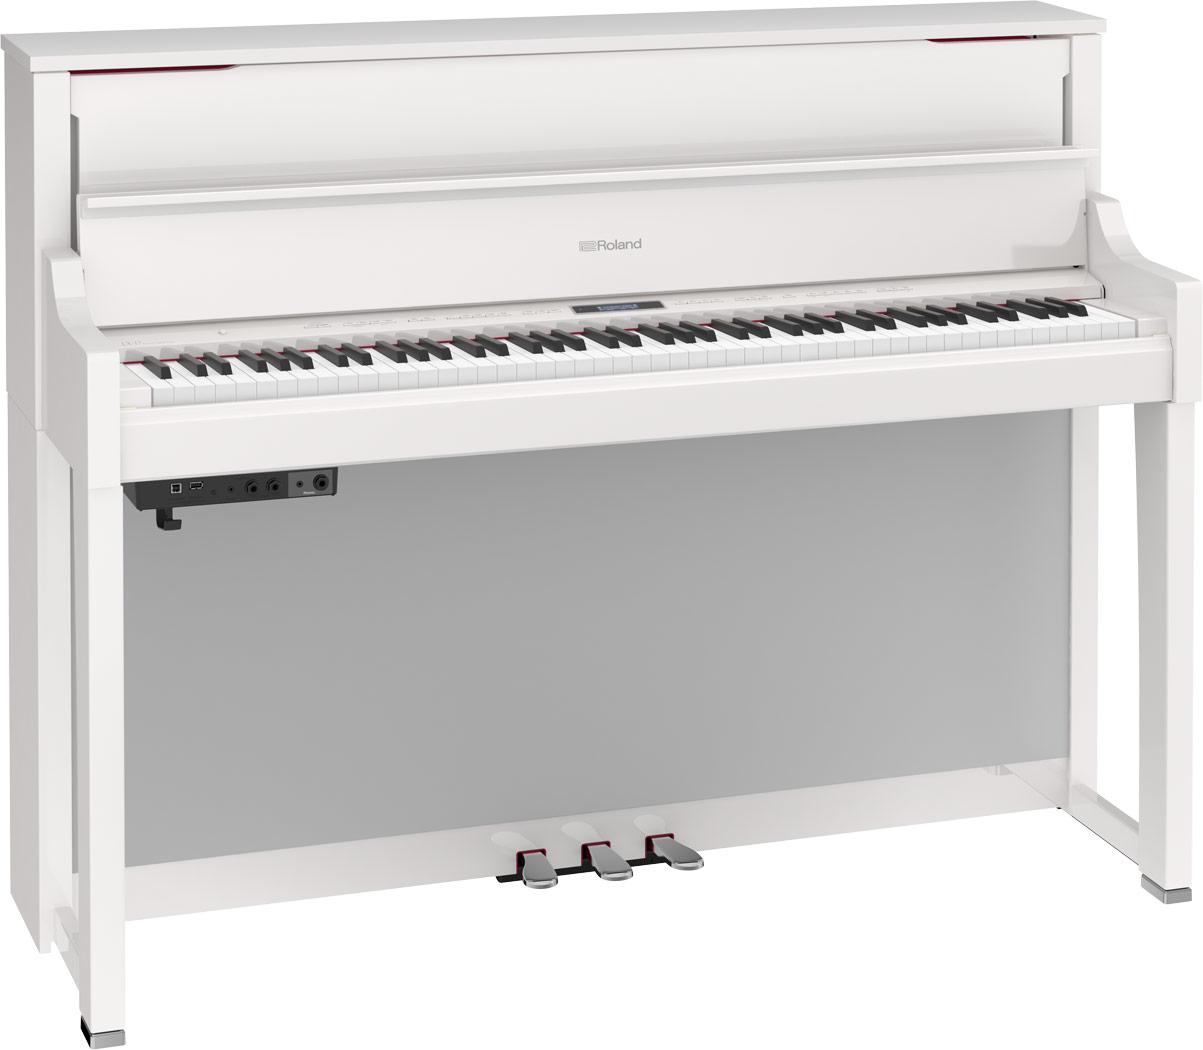 Roland - LX-17 | Piano Digital